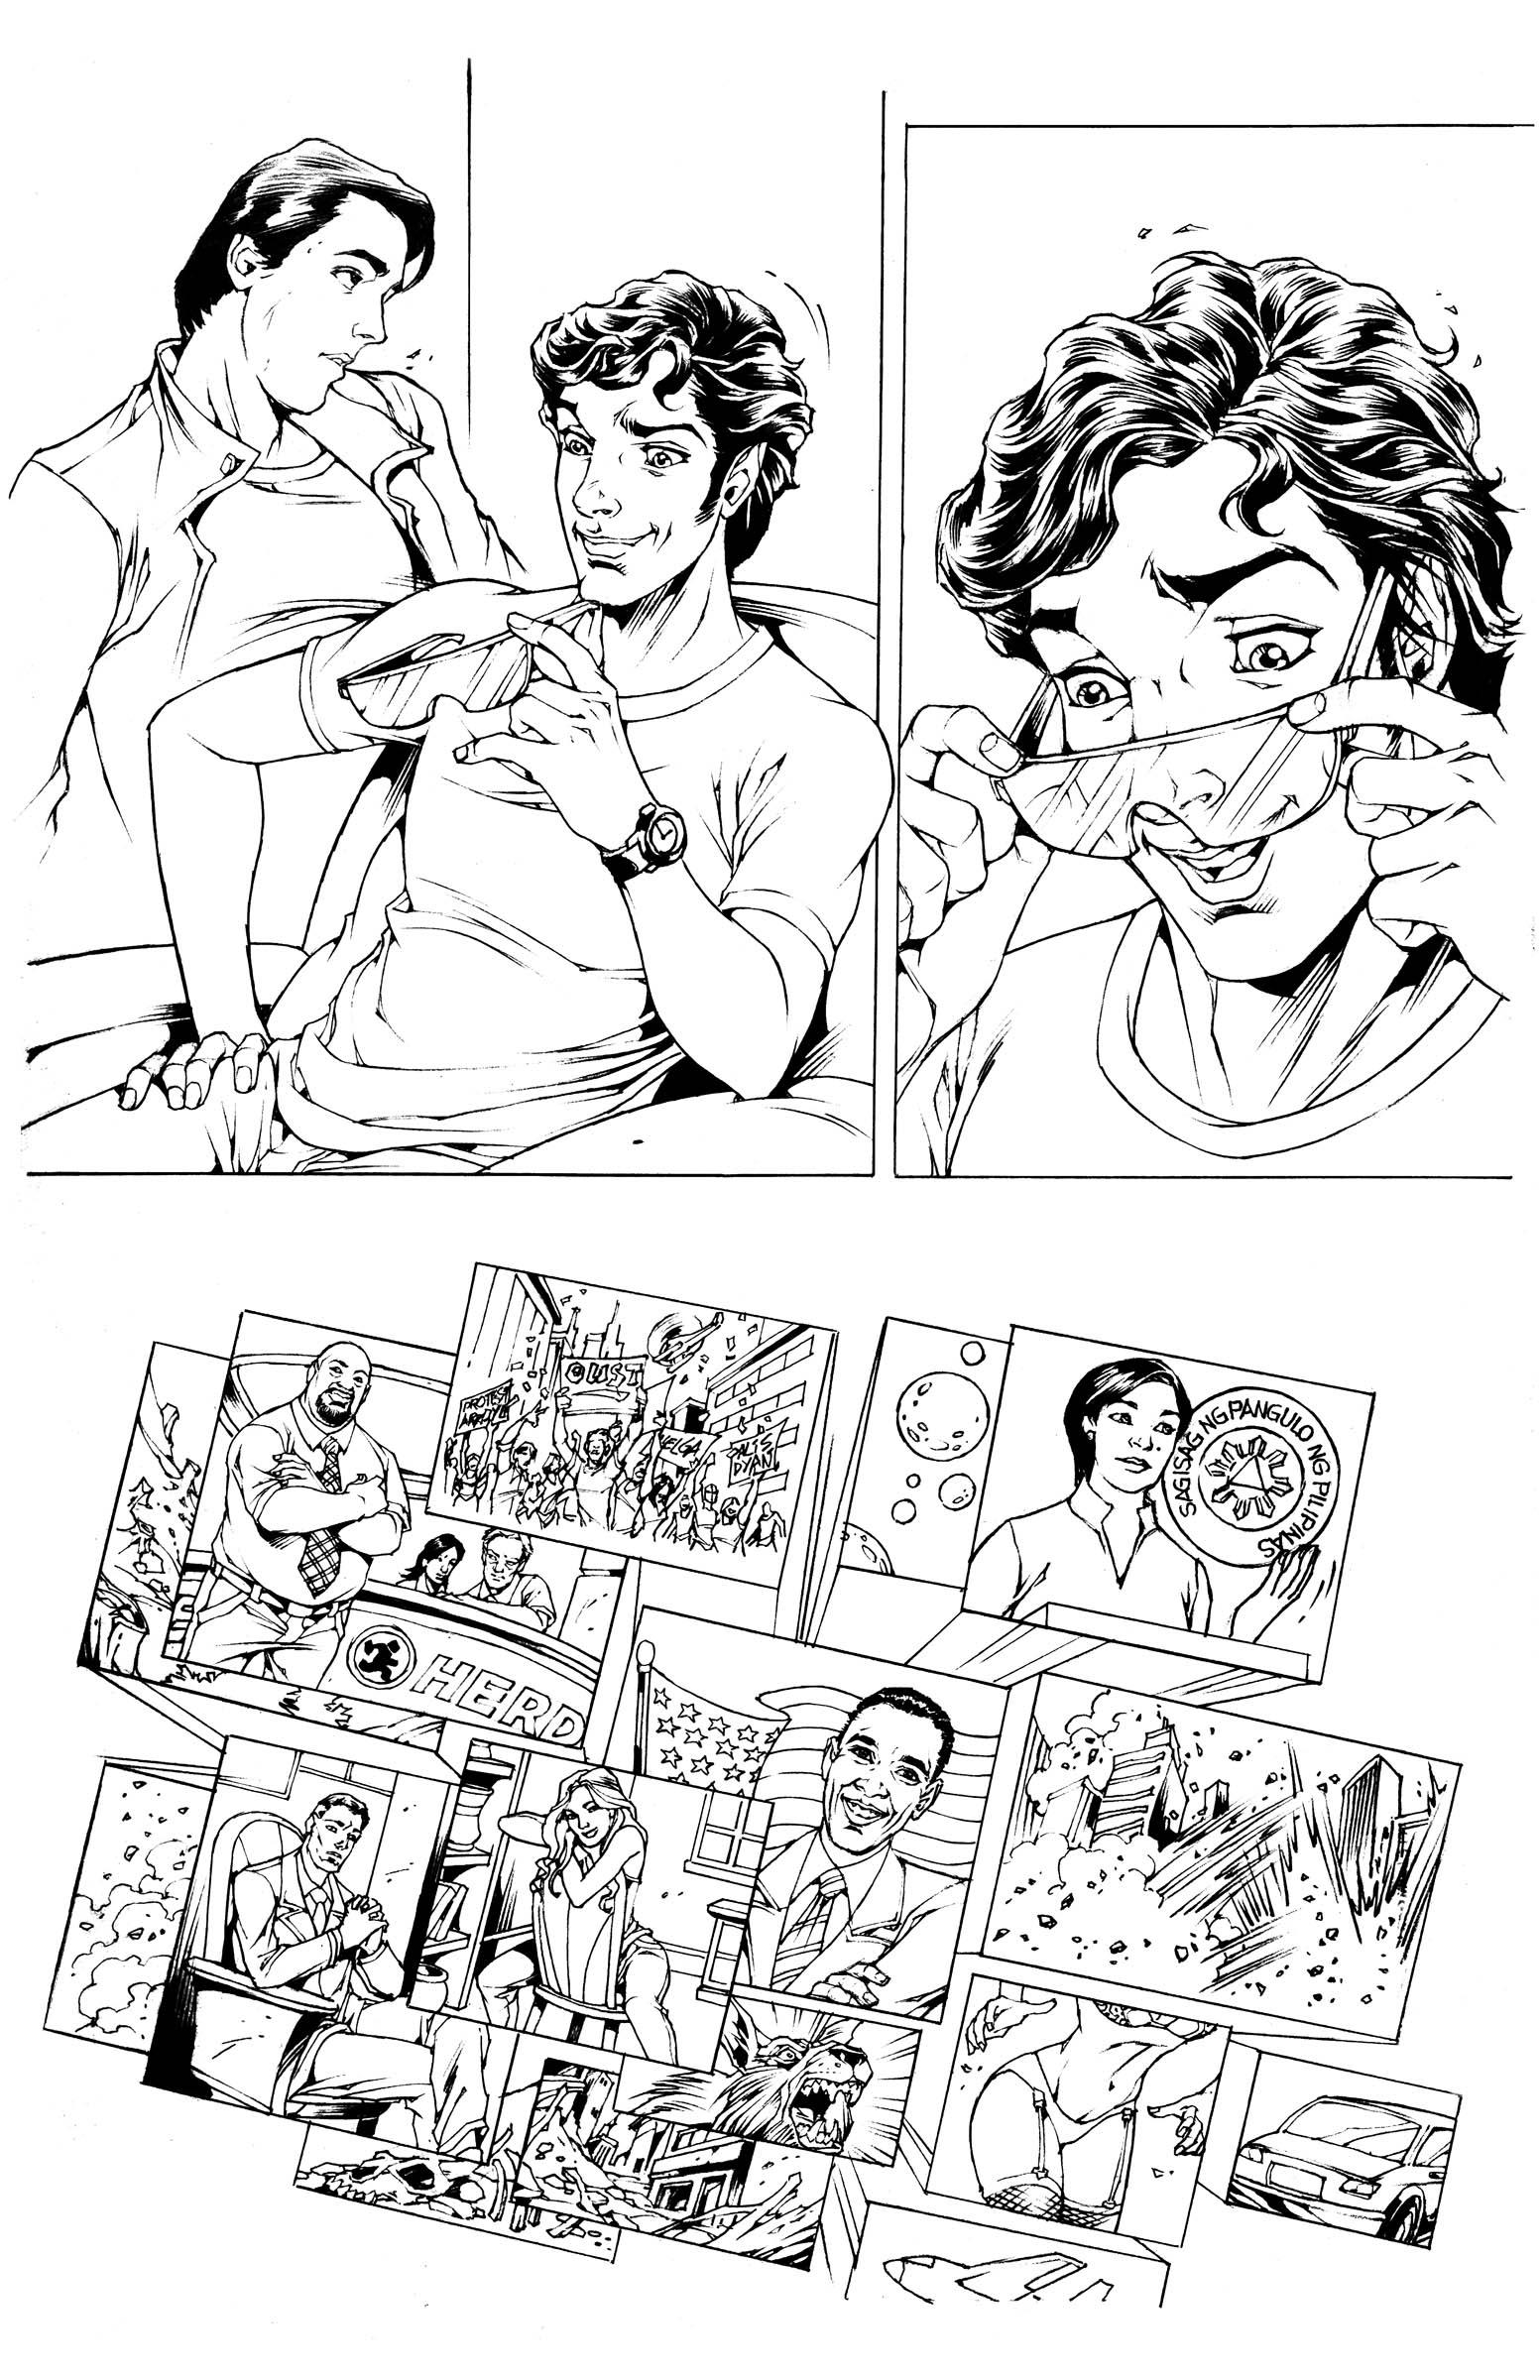 CHUCK -- Page 3 by Jinky Coronado